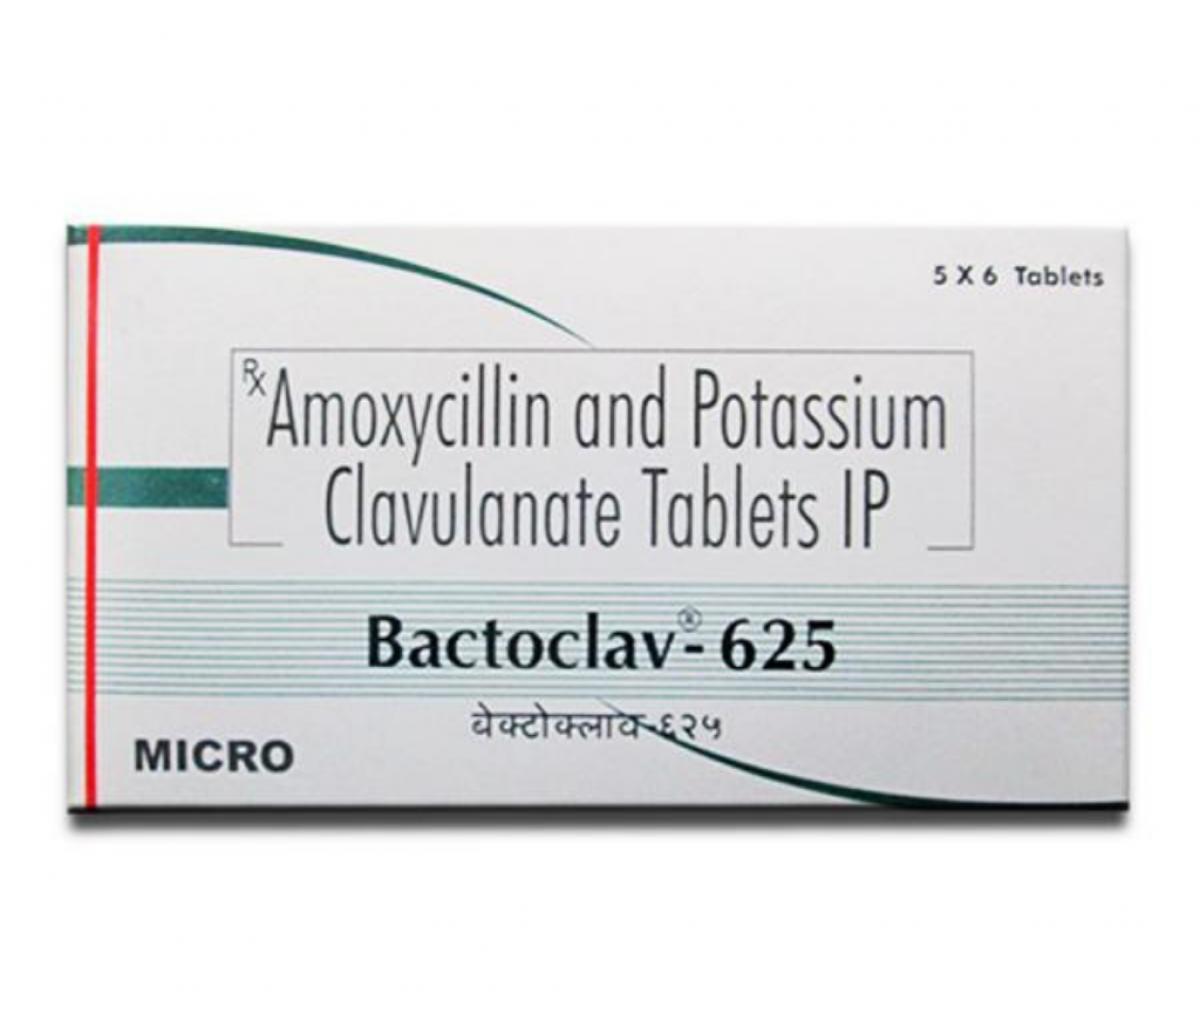 Bactoclav 625mg BP Tablet